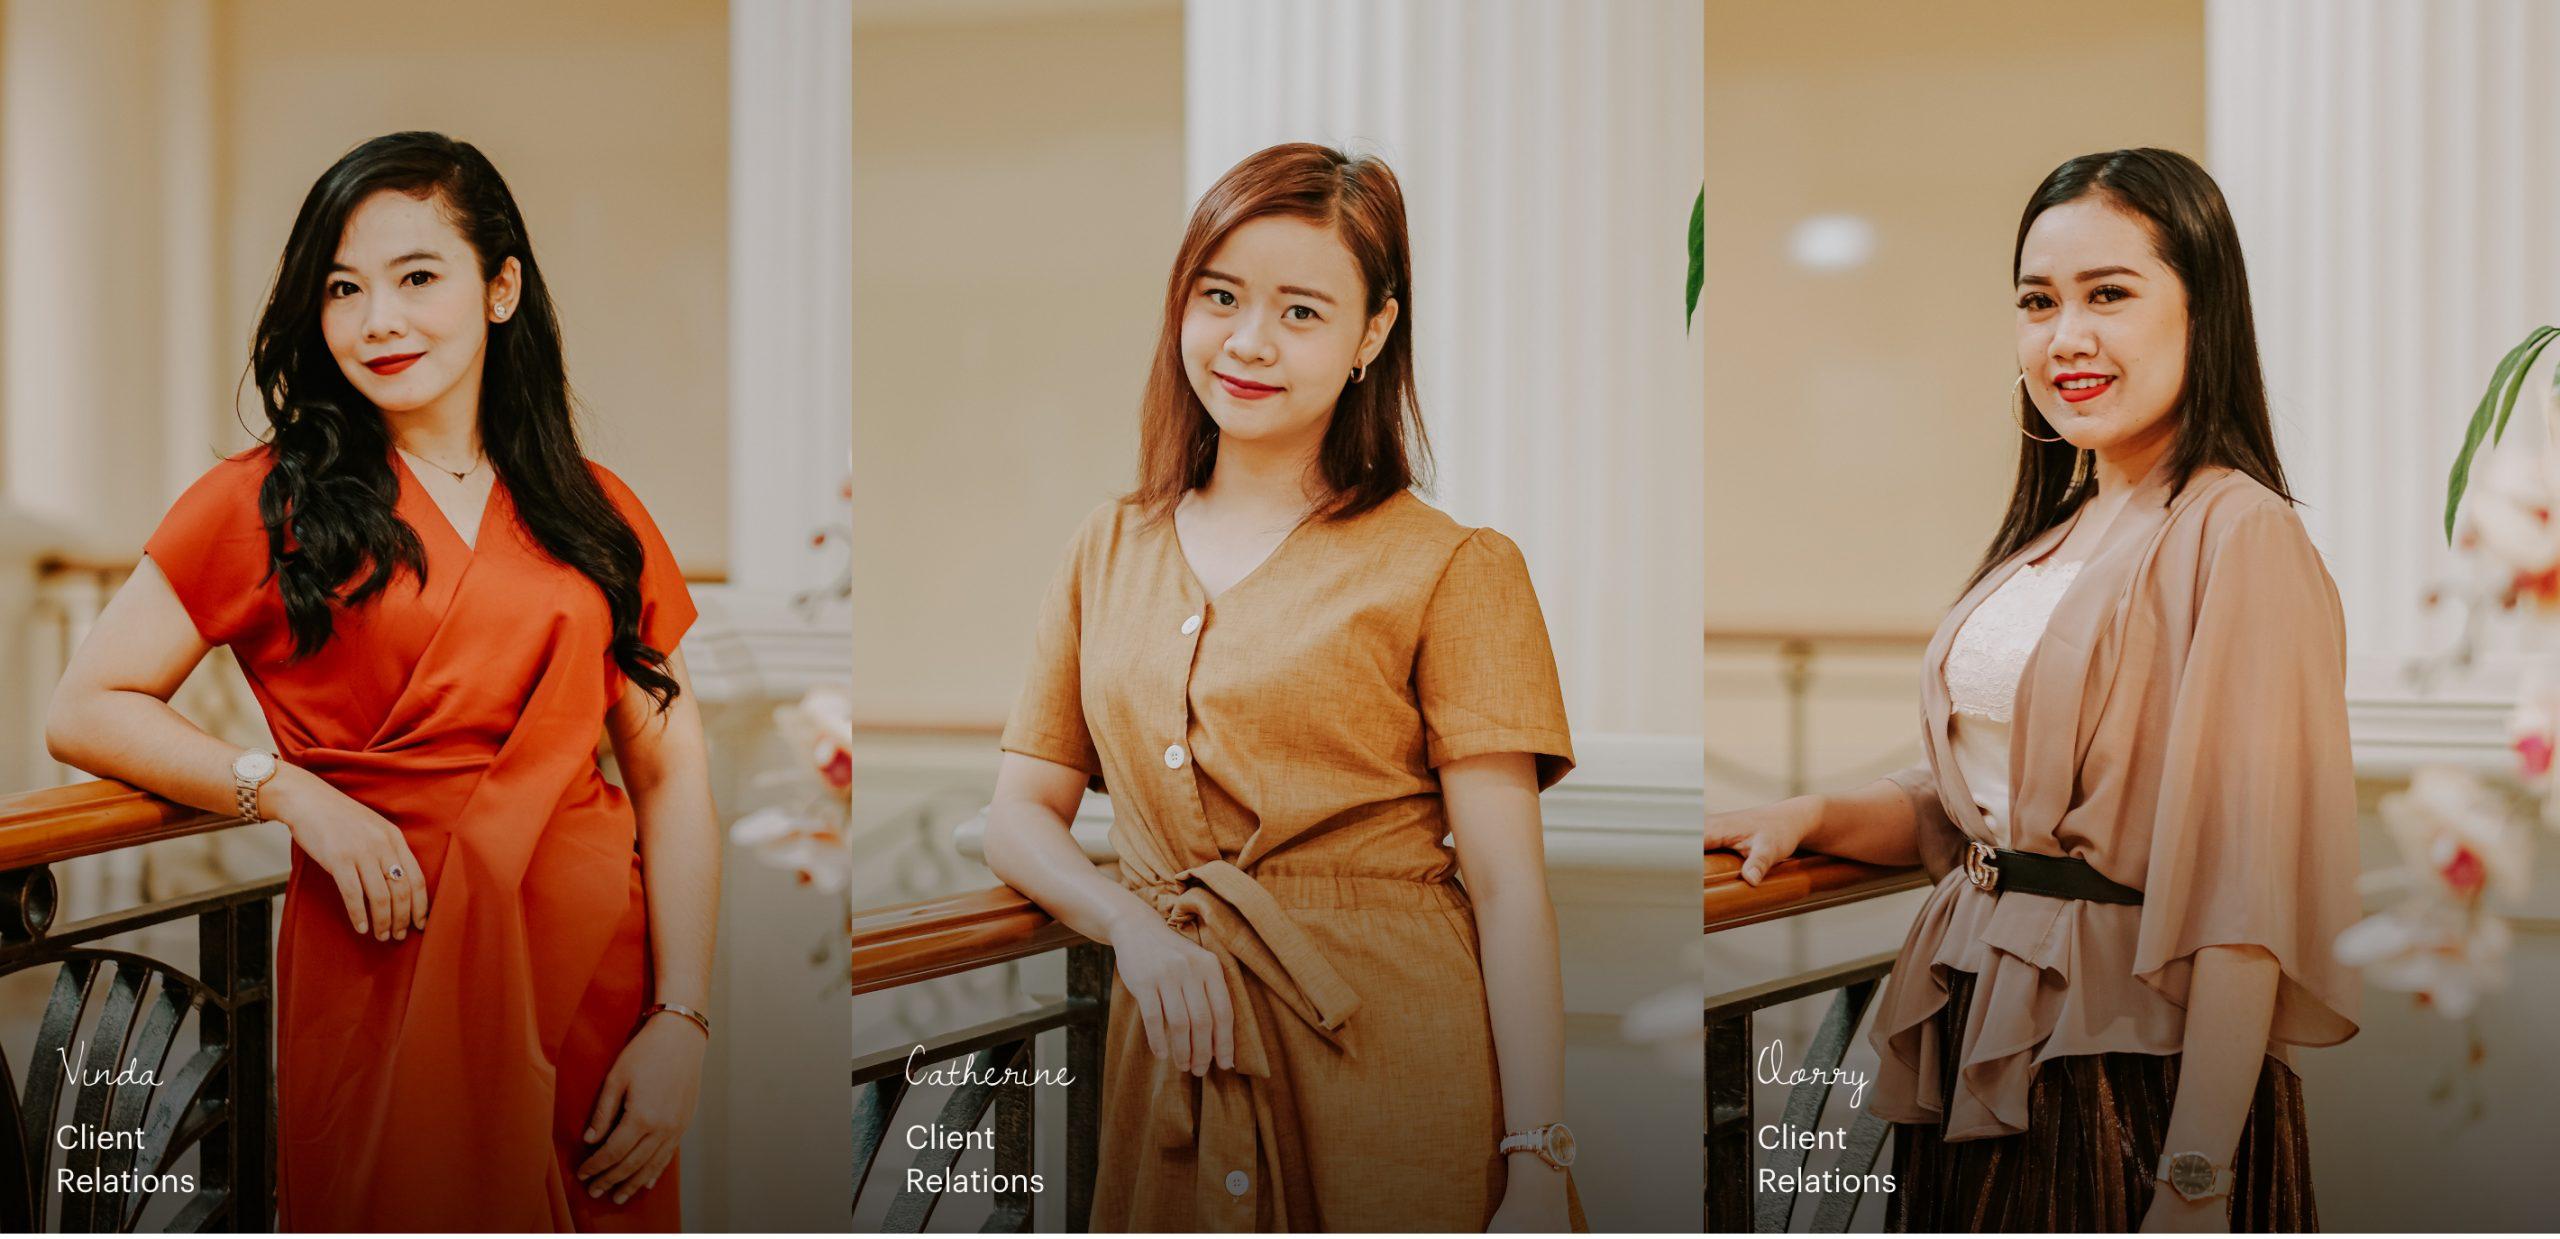 Customer Relations - Tiara Hana Indonesia